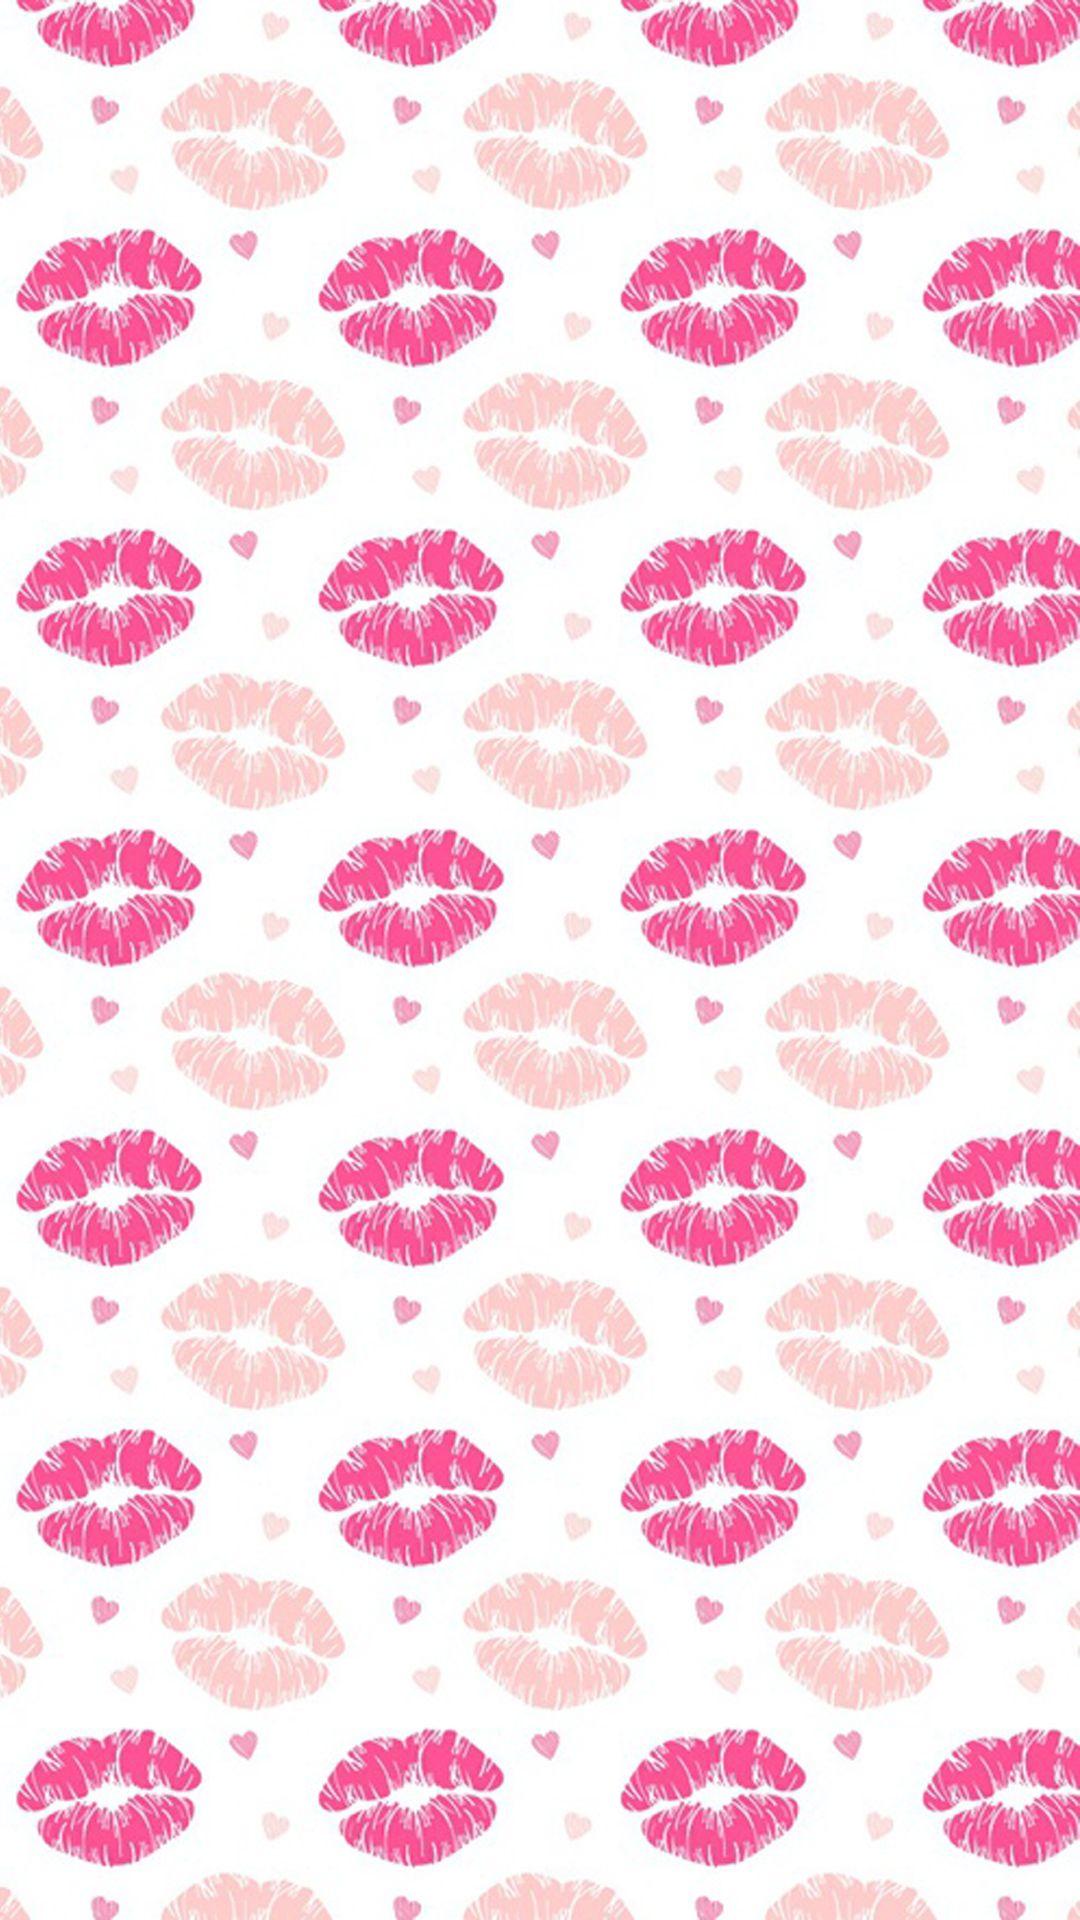 kisses | galaxy s7 wallpapers | pinterest | kiss, wallpaper and hd